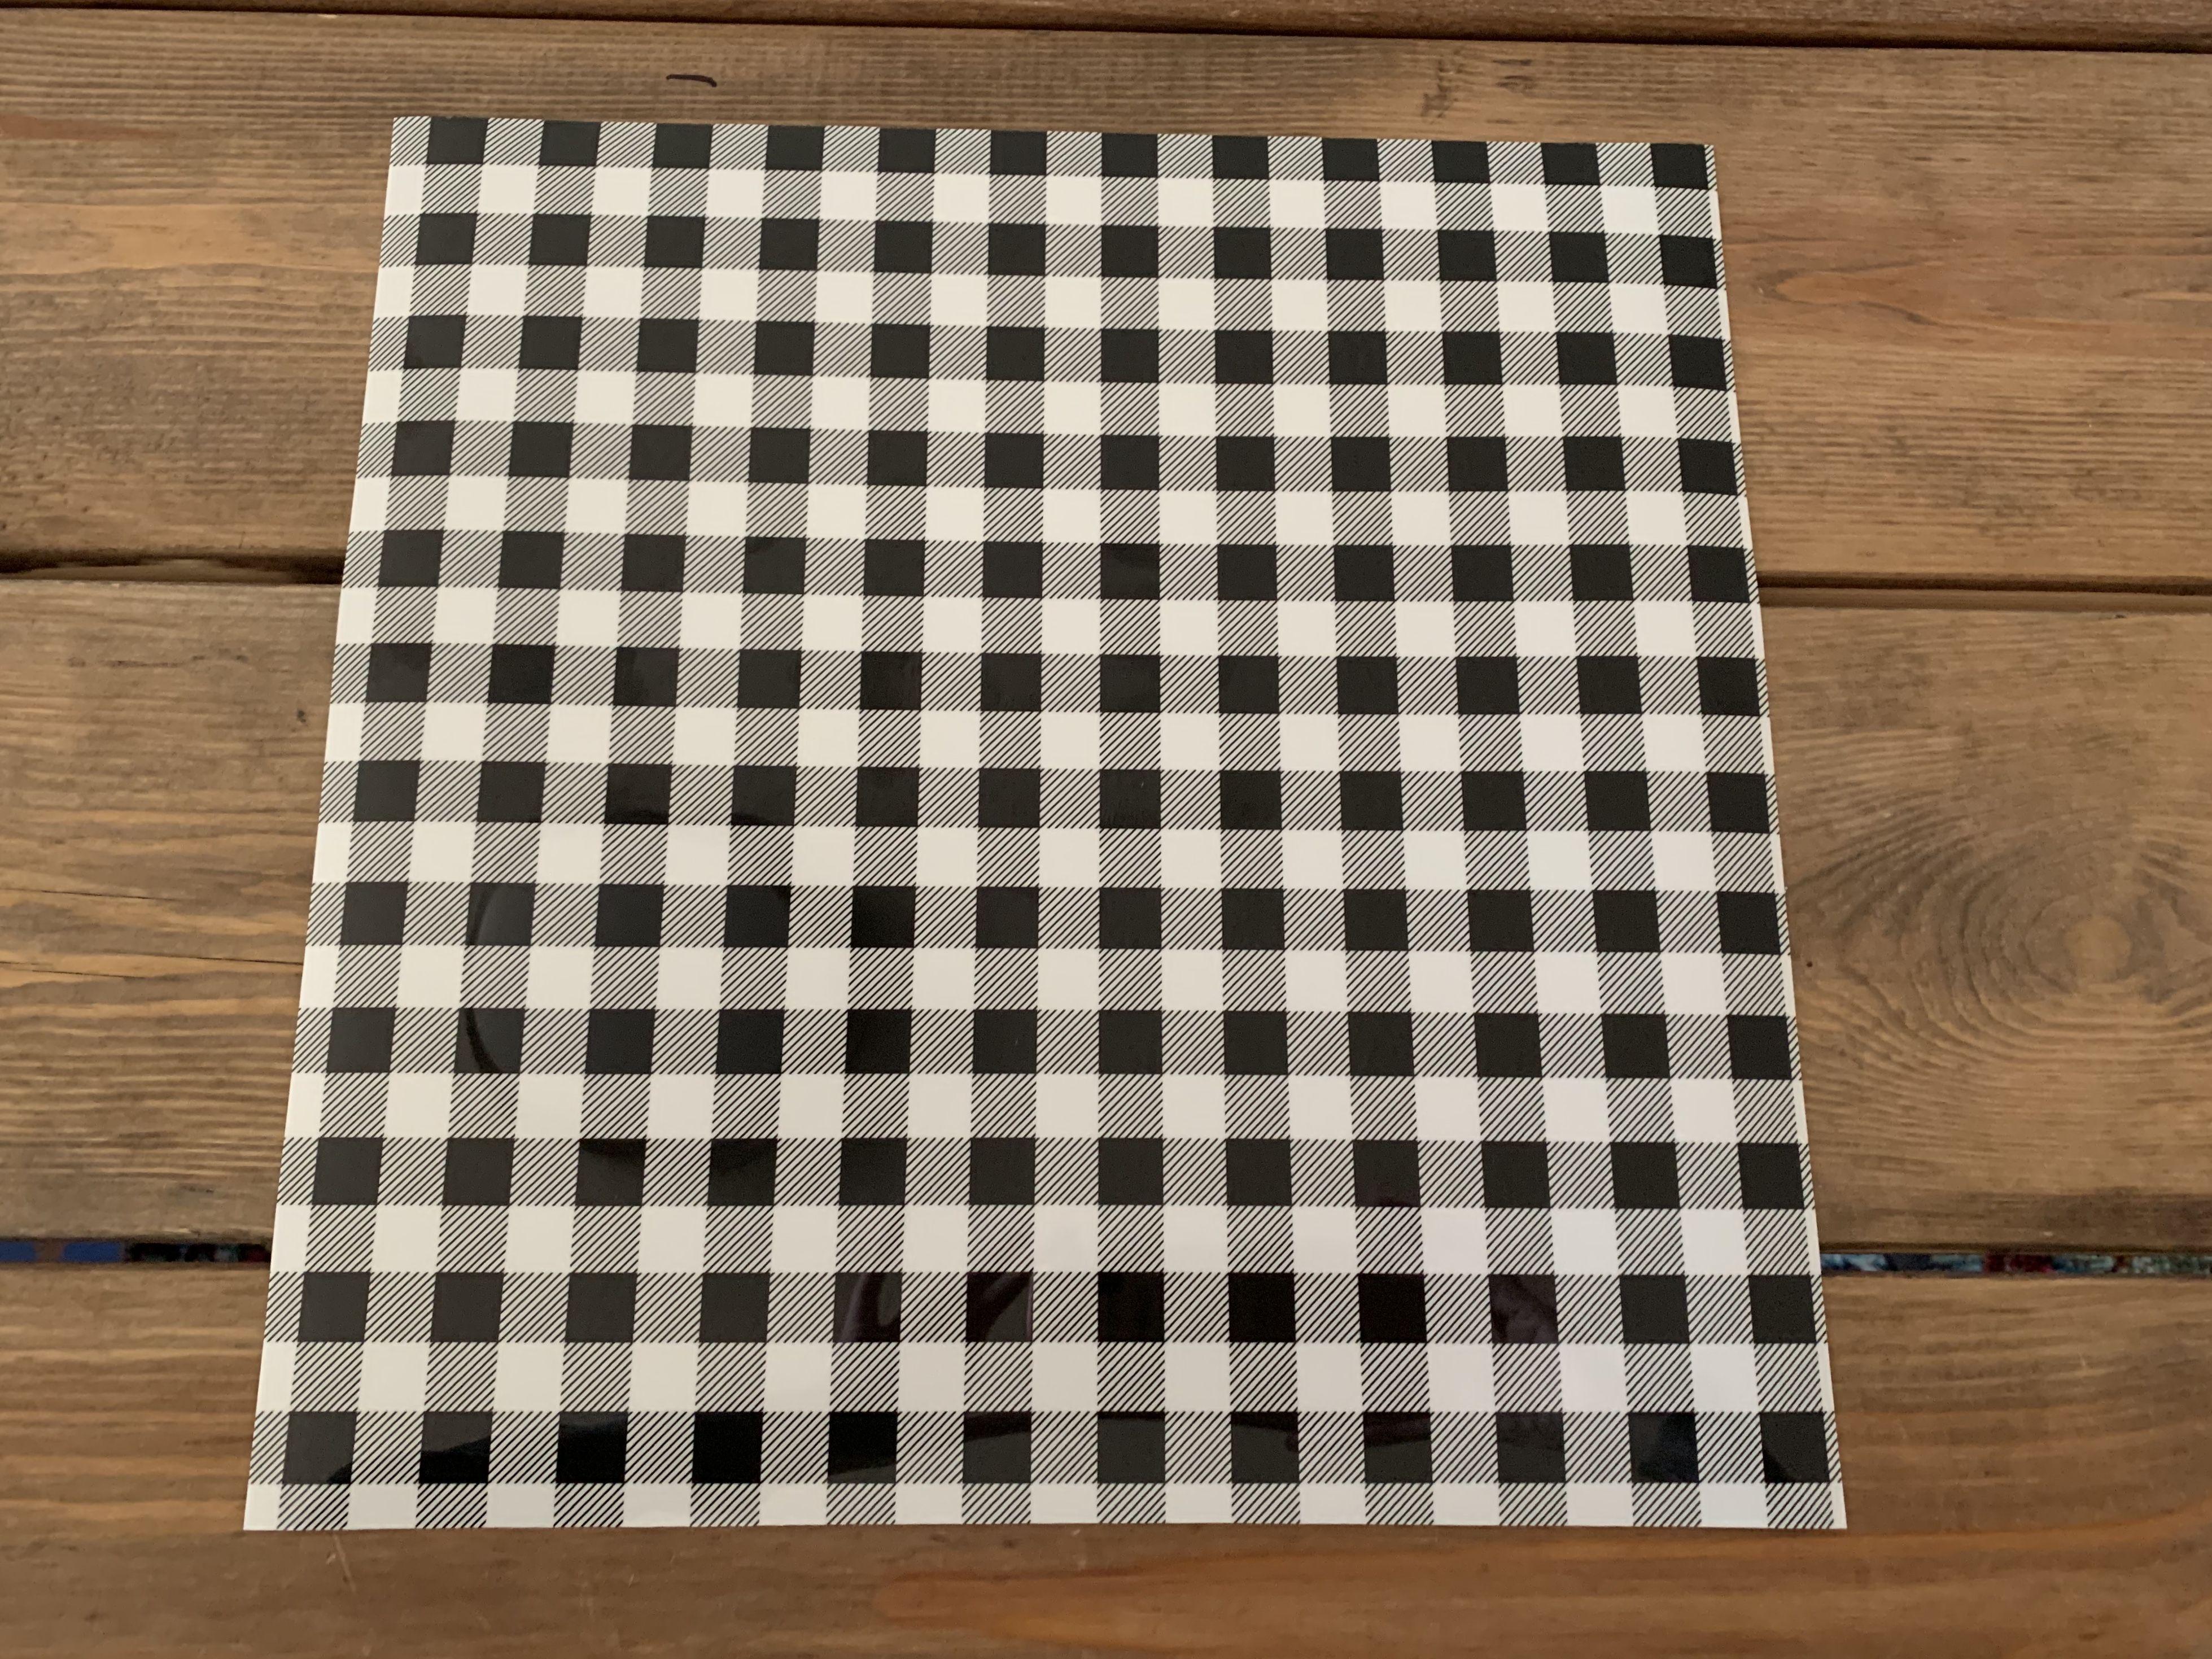 Buffalo Plaid Htv White And Black Buffalo Plaid Htv In 2020 Patterned Heat Transfer Vinyl Buffalo Plaid Pattern Heat Transfer Vinyl